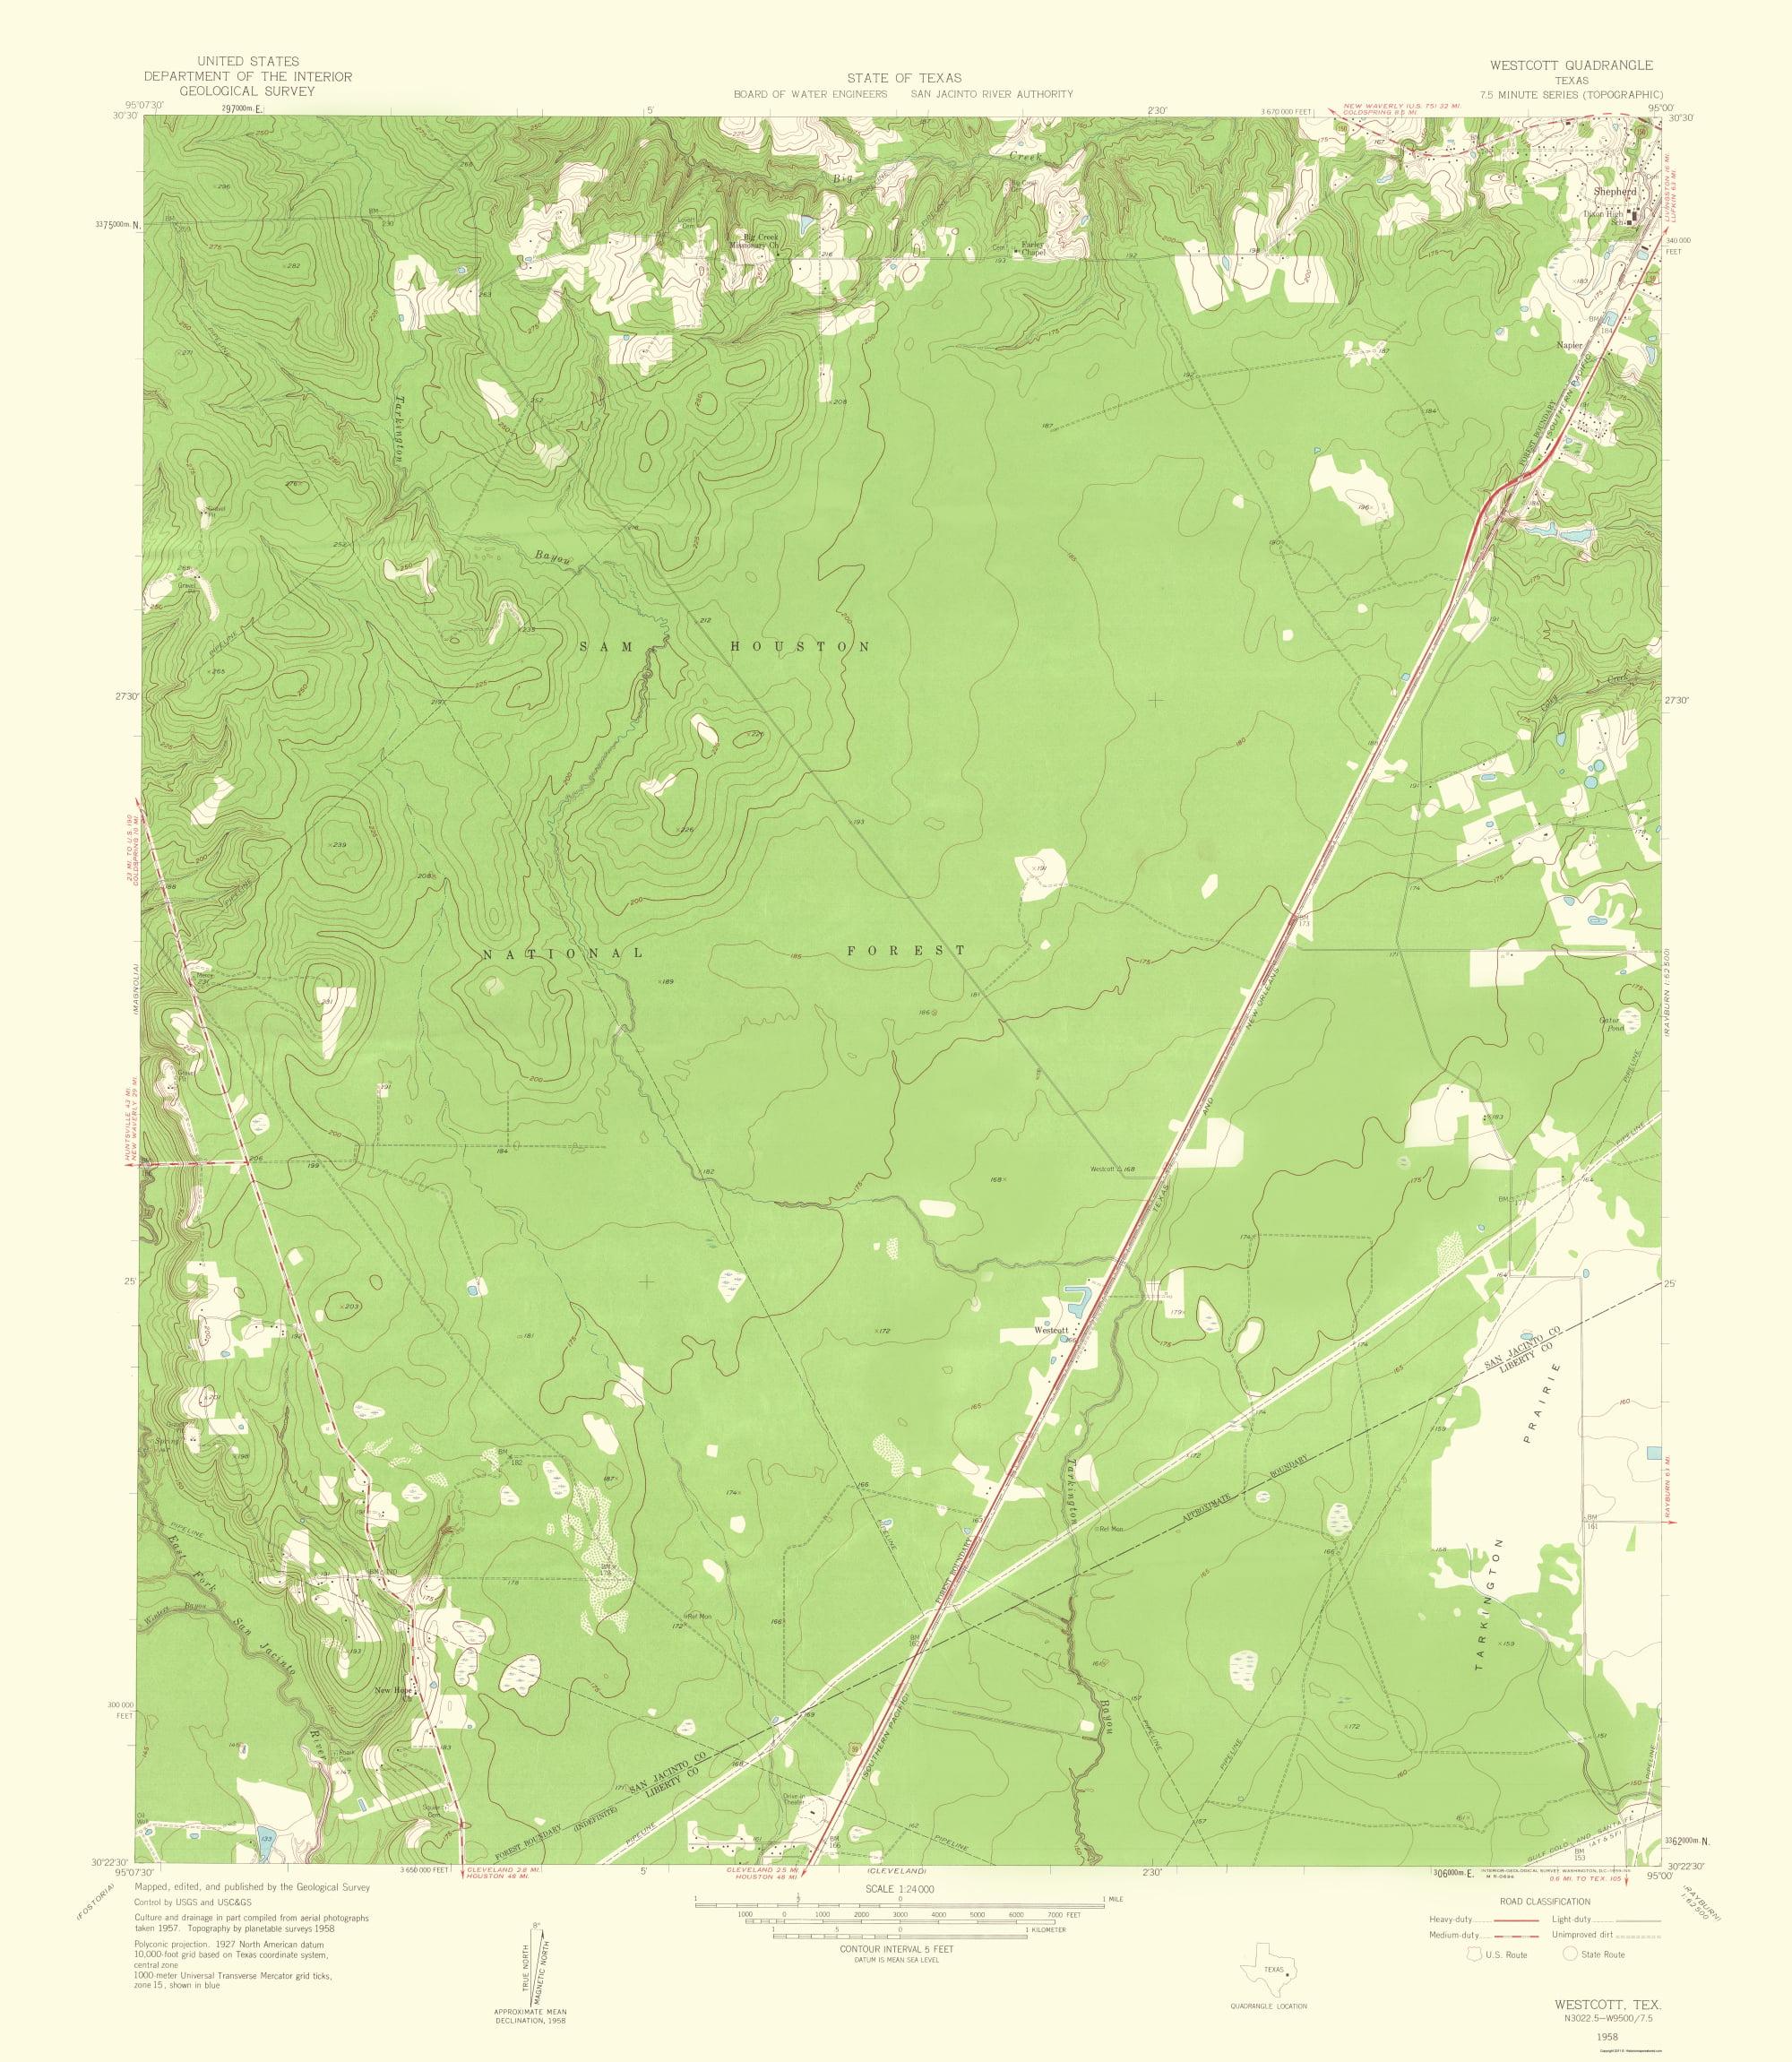 Topographical Map Print - Westcott Texas - USGS 1959 - 23 x 26.46 on mayo clinic rochester map, csu east bay map, duke map, los angeles cities map, galveston texas city map, michigan state university campus map, unc map, uc berkeley map, jcu map, piedmont tech map, university of michigan map, university of oregon campus map, stanford university map, west texas state map, hcc ybor campus map, la southwest college map, seton hall map, harvard map, university of ca map, ucla map,